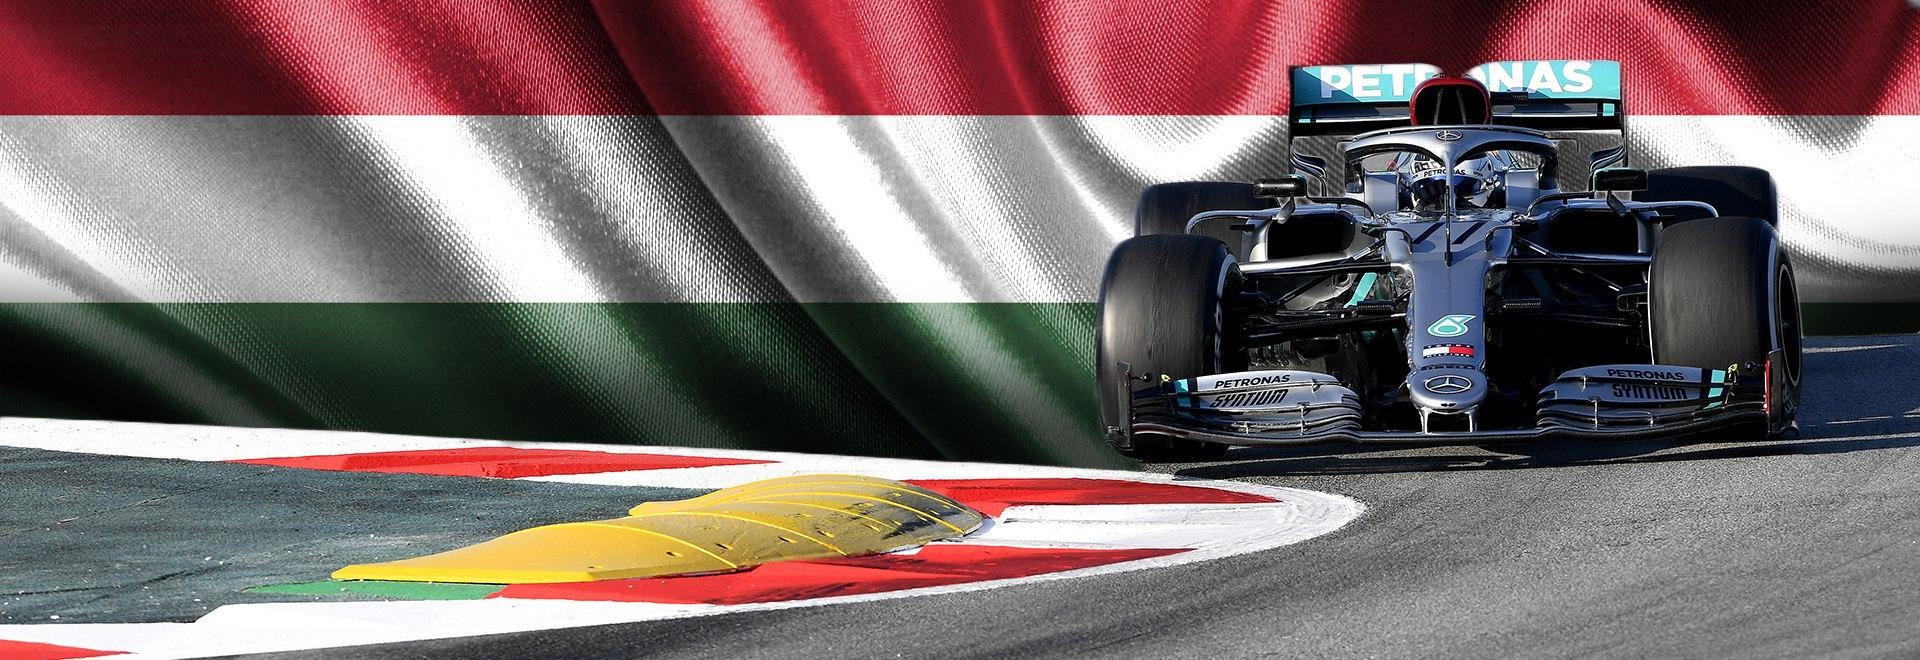 GP Ungheria. Qualifiche